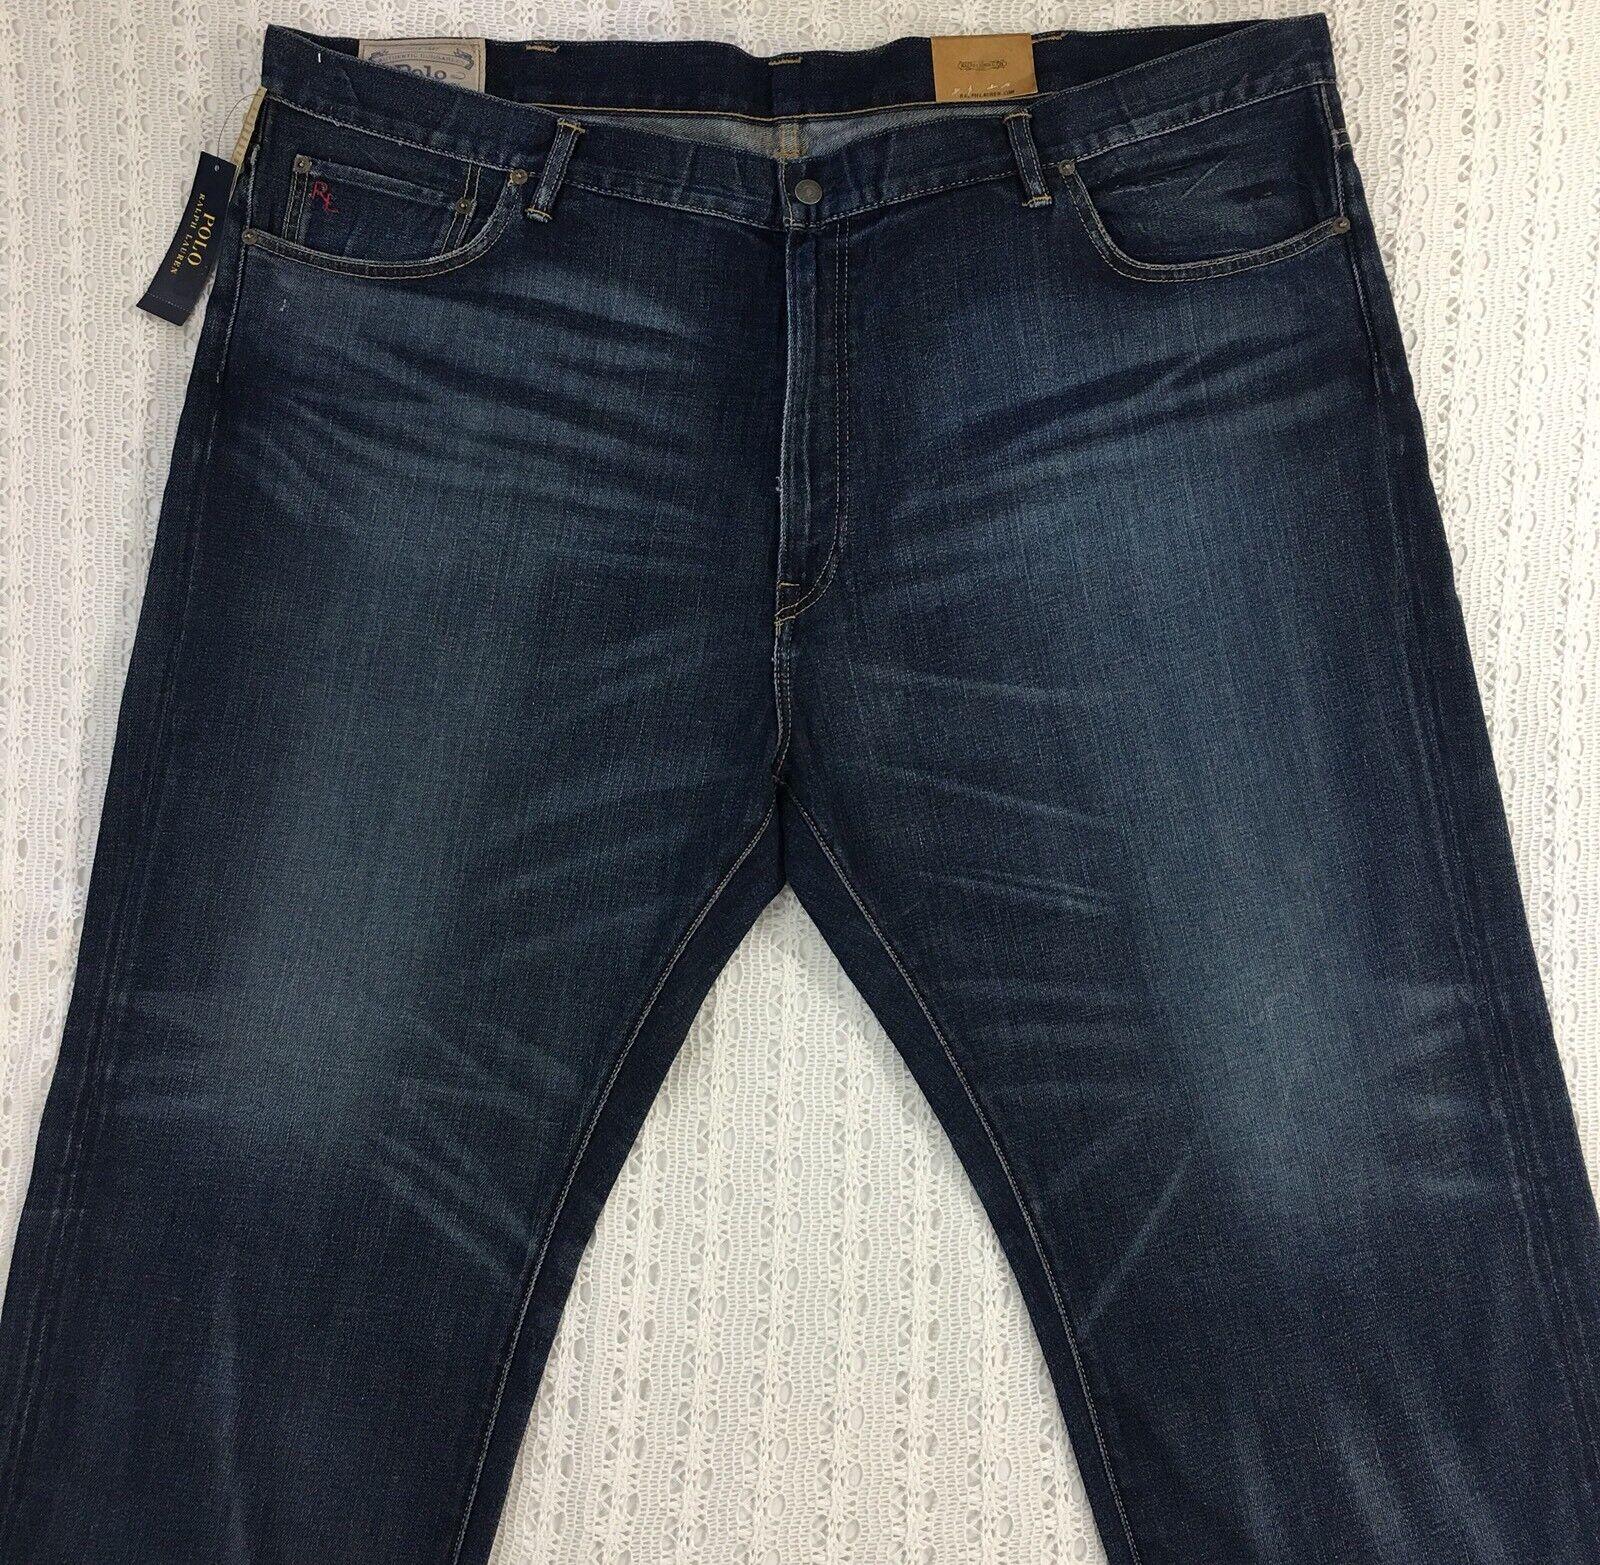 Men's POLO RALPH LAUREN Hampton Straight bluee Jeans 50B x 30 50 30 NWT  New